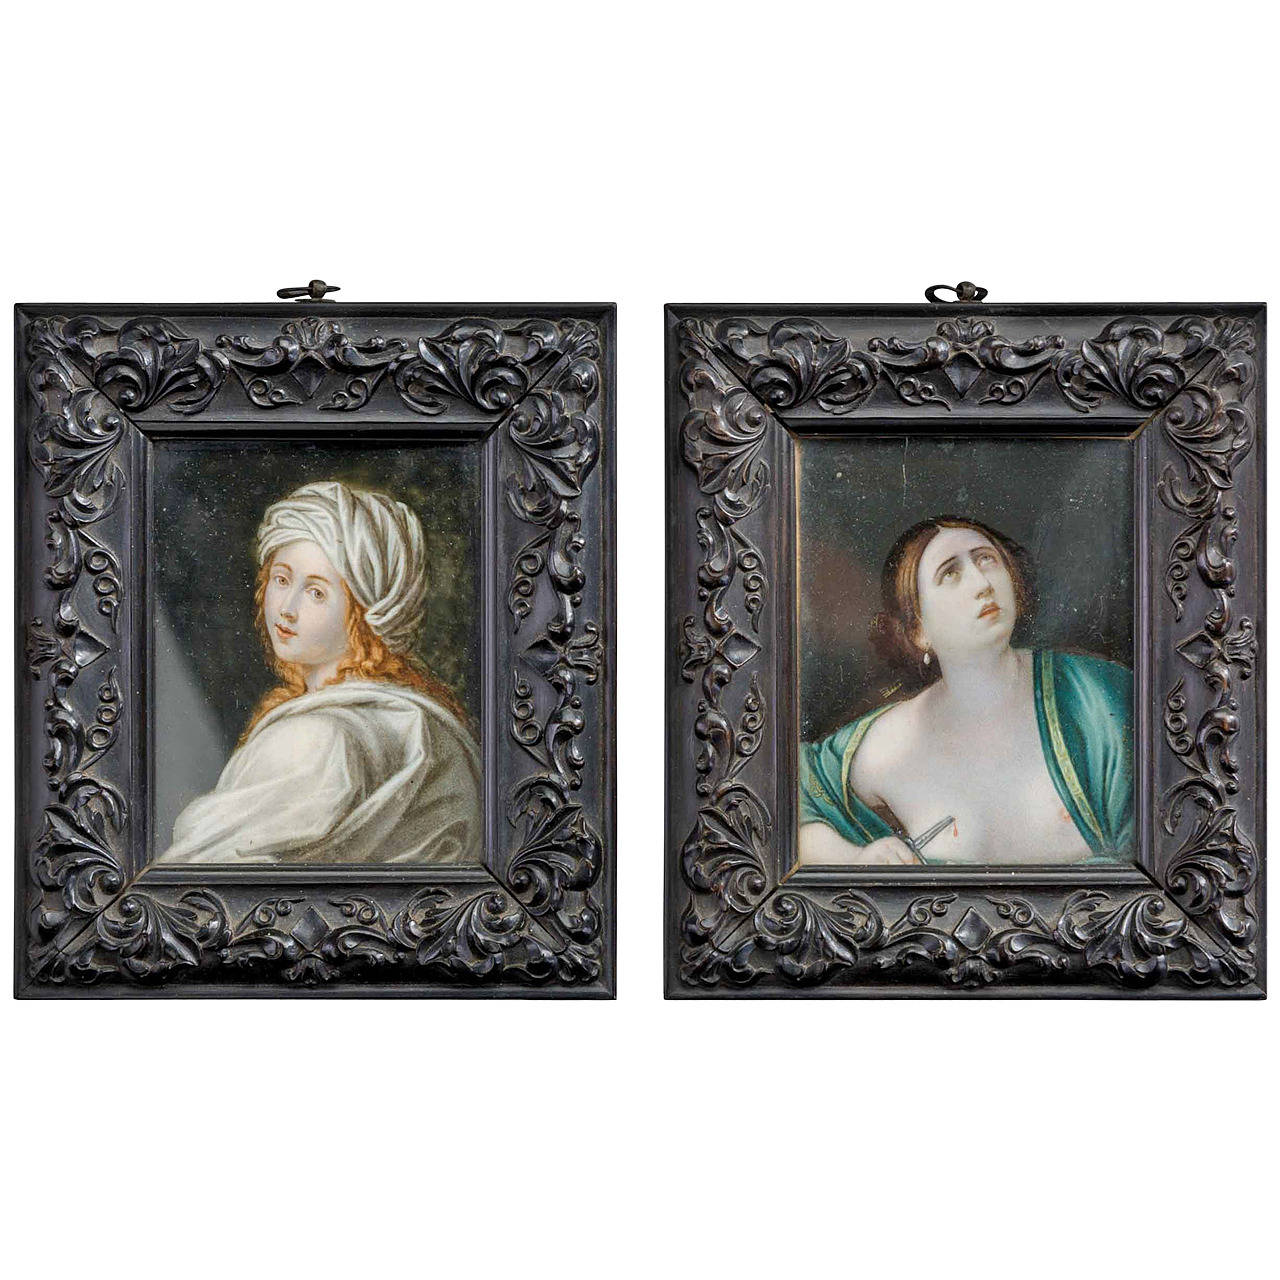 Pair of 19th Century Framed Miniature Paintings